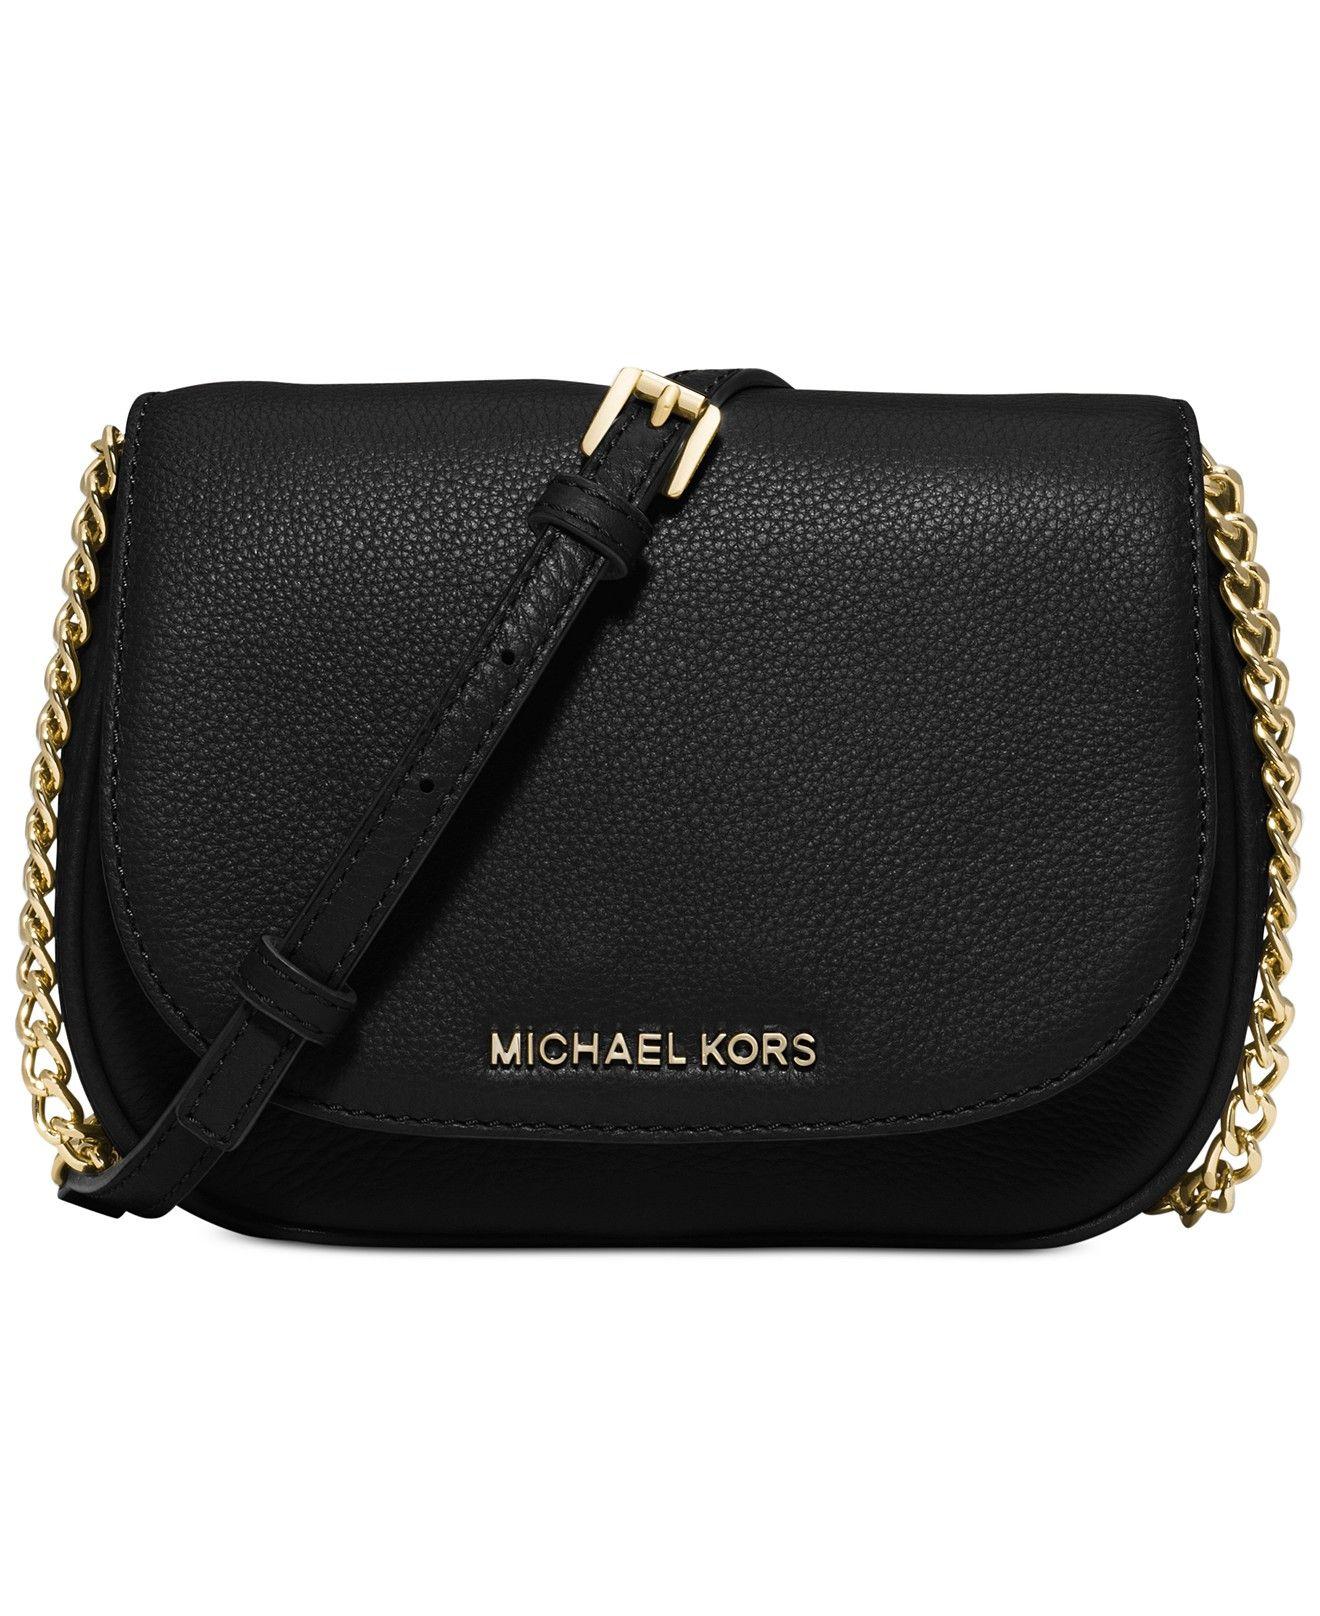 ... saddle bag vanilla lagala 31818 50279  australia michael michael kors  bedford small crossbody handbags accessories macys 9e545 ff27d e7698a2165887